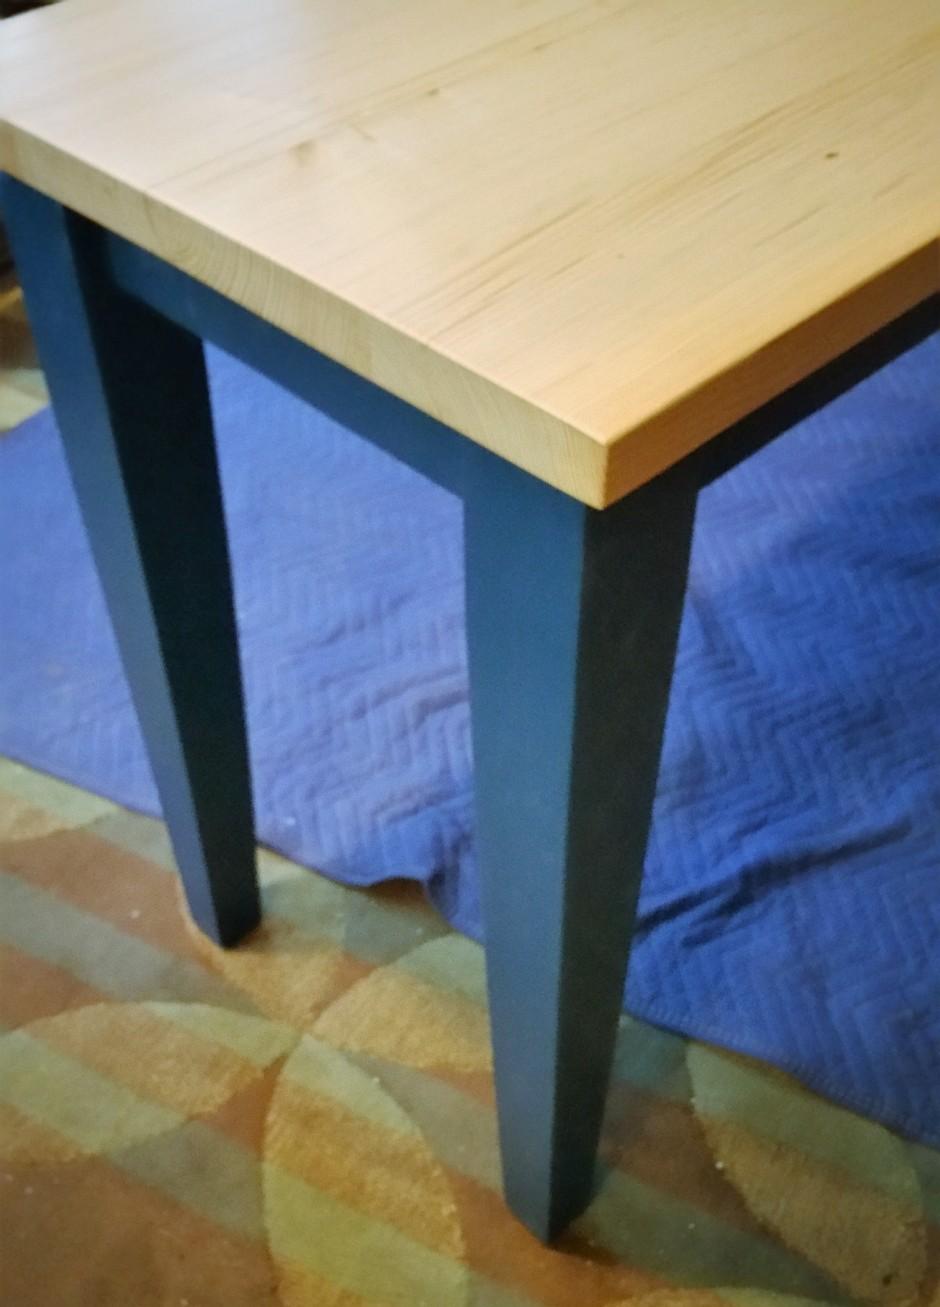 sofa table assembled